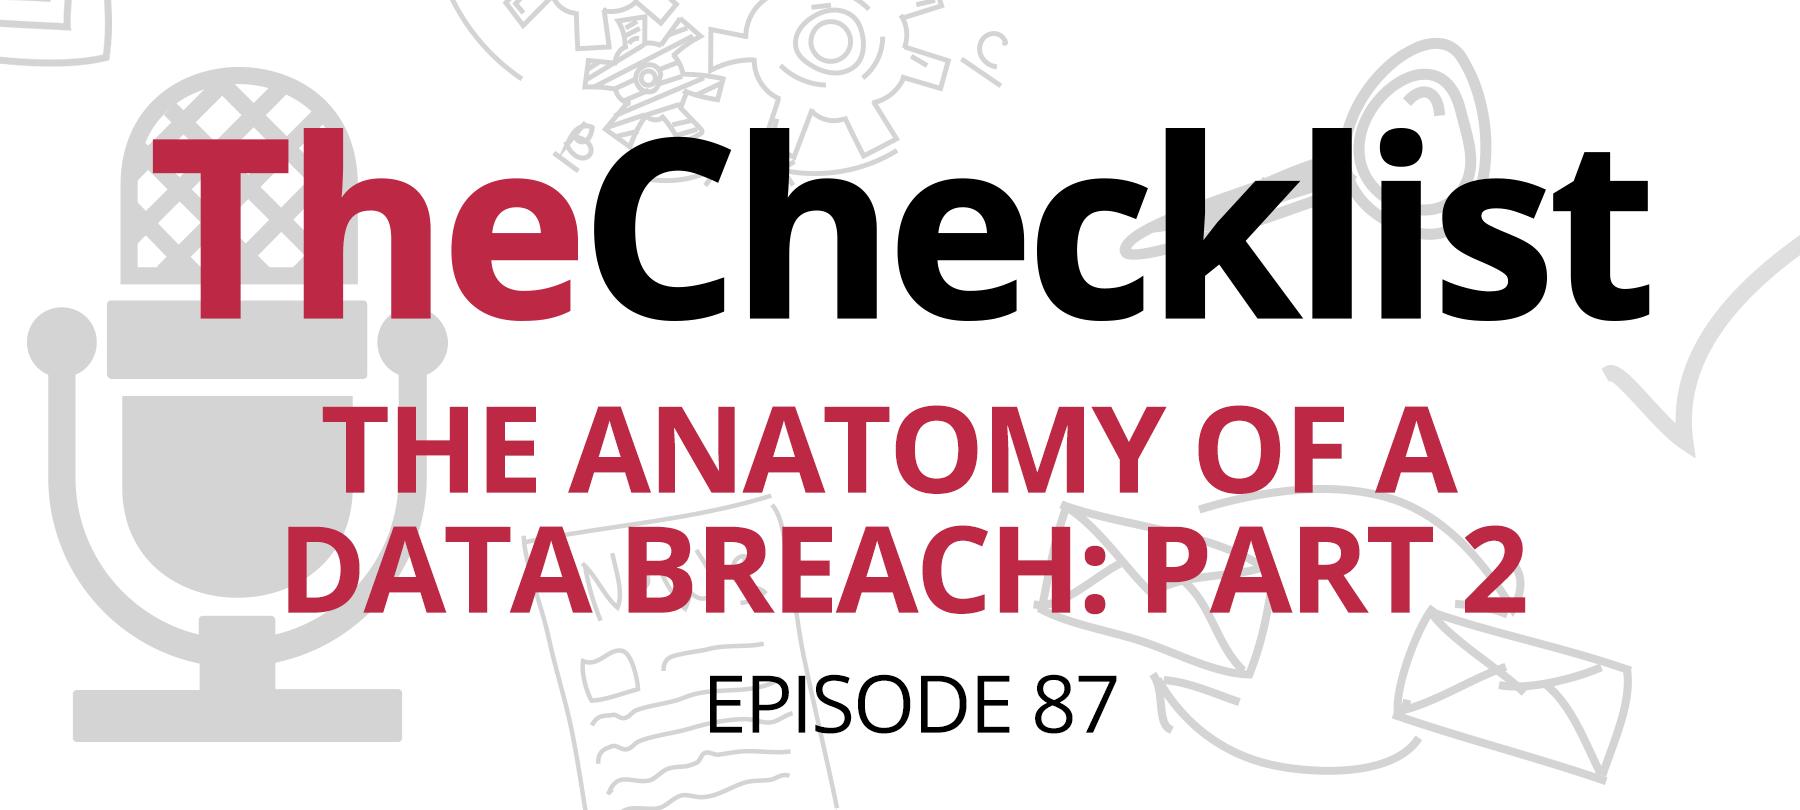 Checklist 87: The Anatomy of a Data Breach, Part 2 - SecureMac